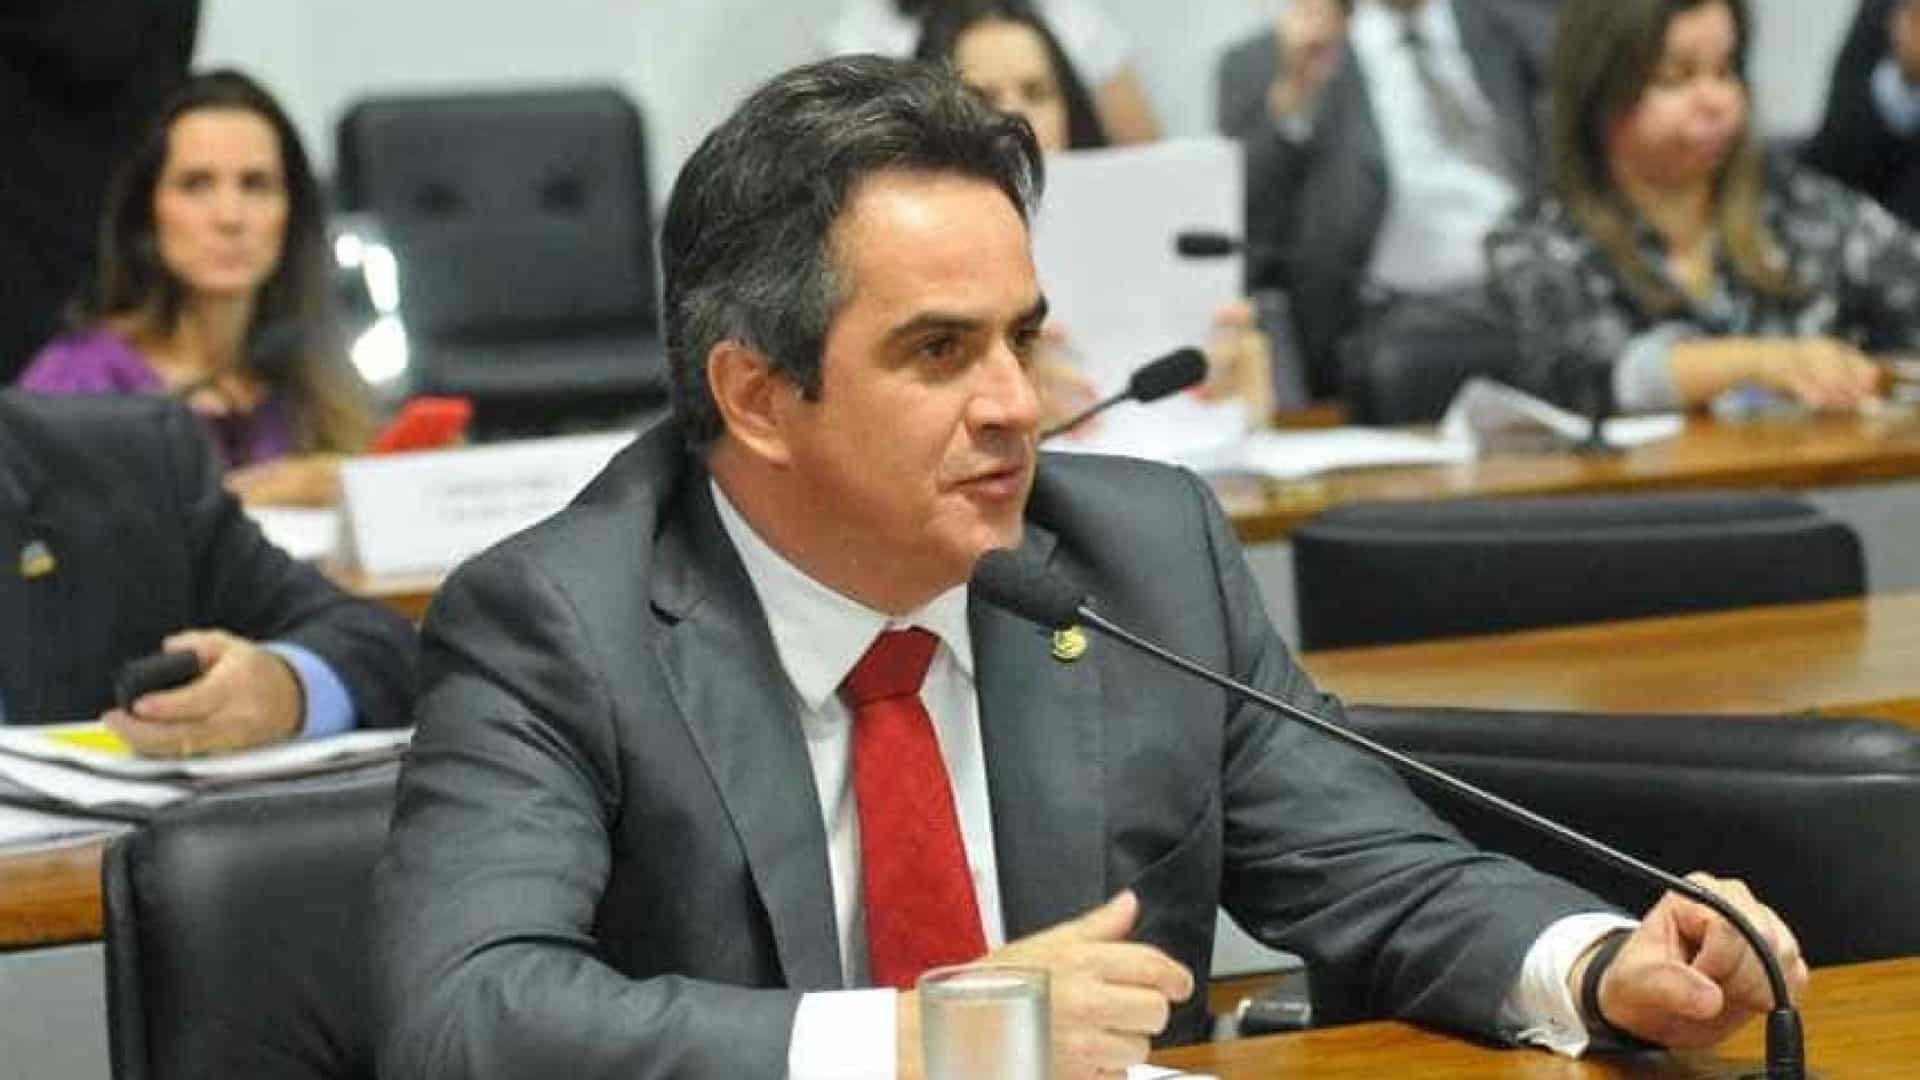 Antes da Casa Civil de Bolsonaro, Ciro queria realizar os 'sonhos de Lula'